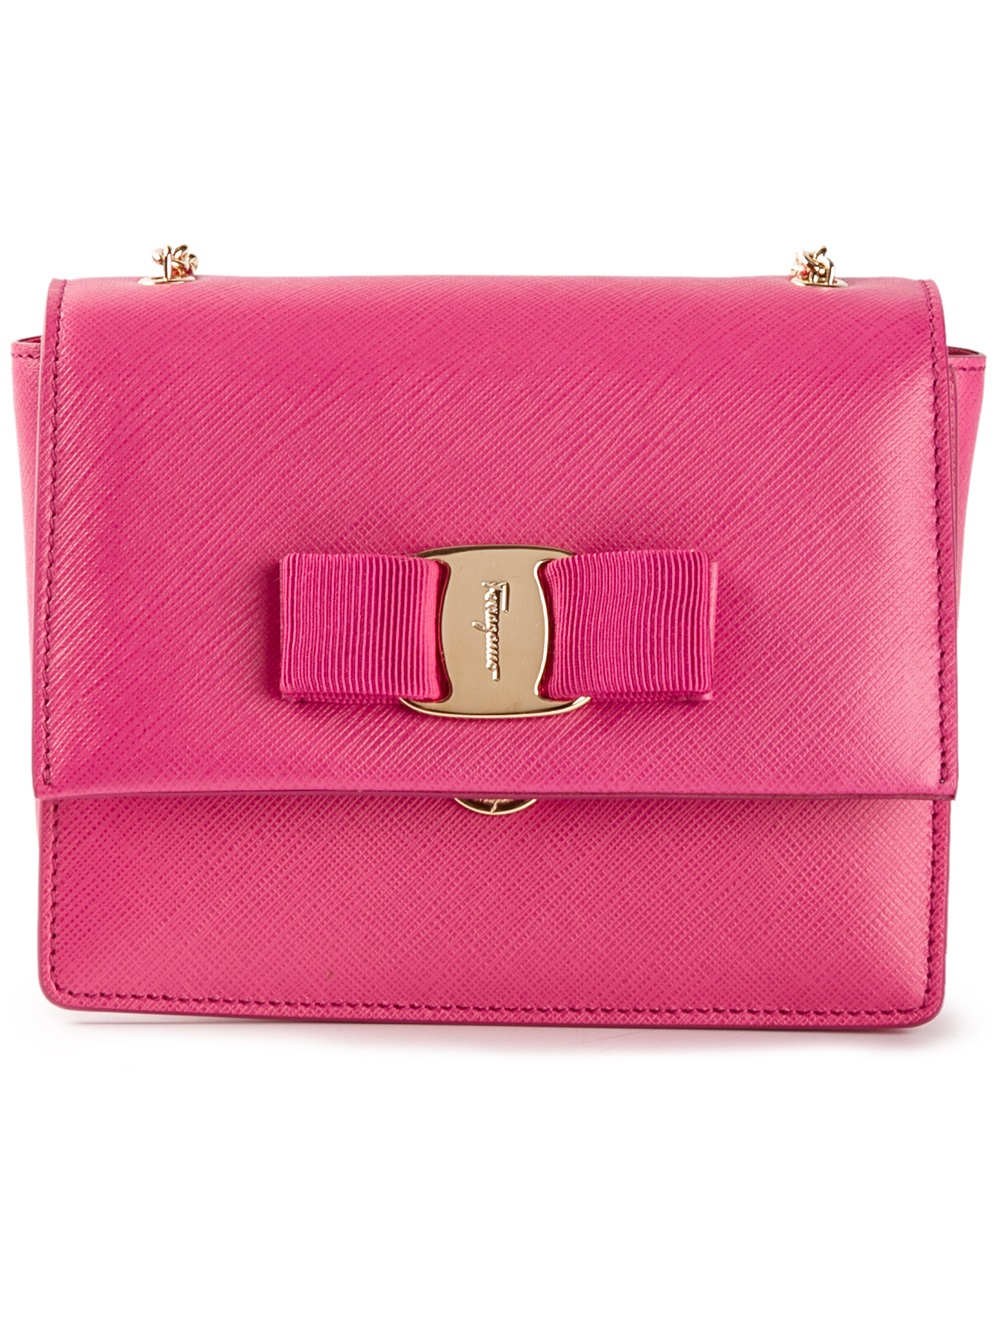 f836ad7e3a64 Ferragamo Ginny Shoulder Bag in Pink - Lyst